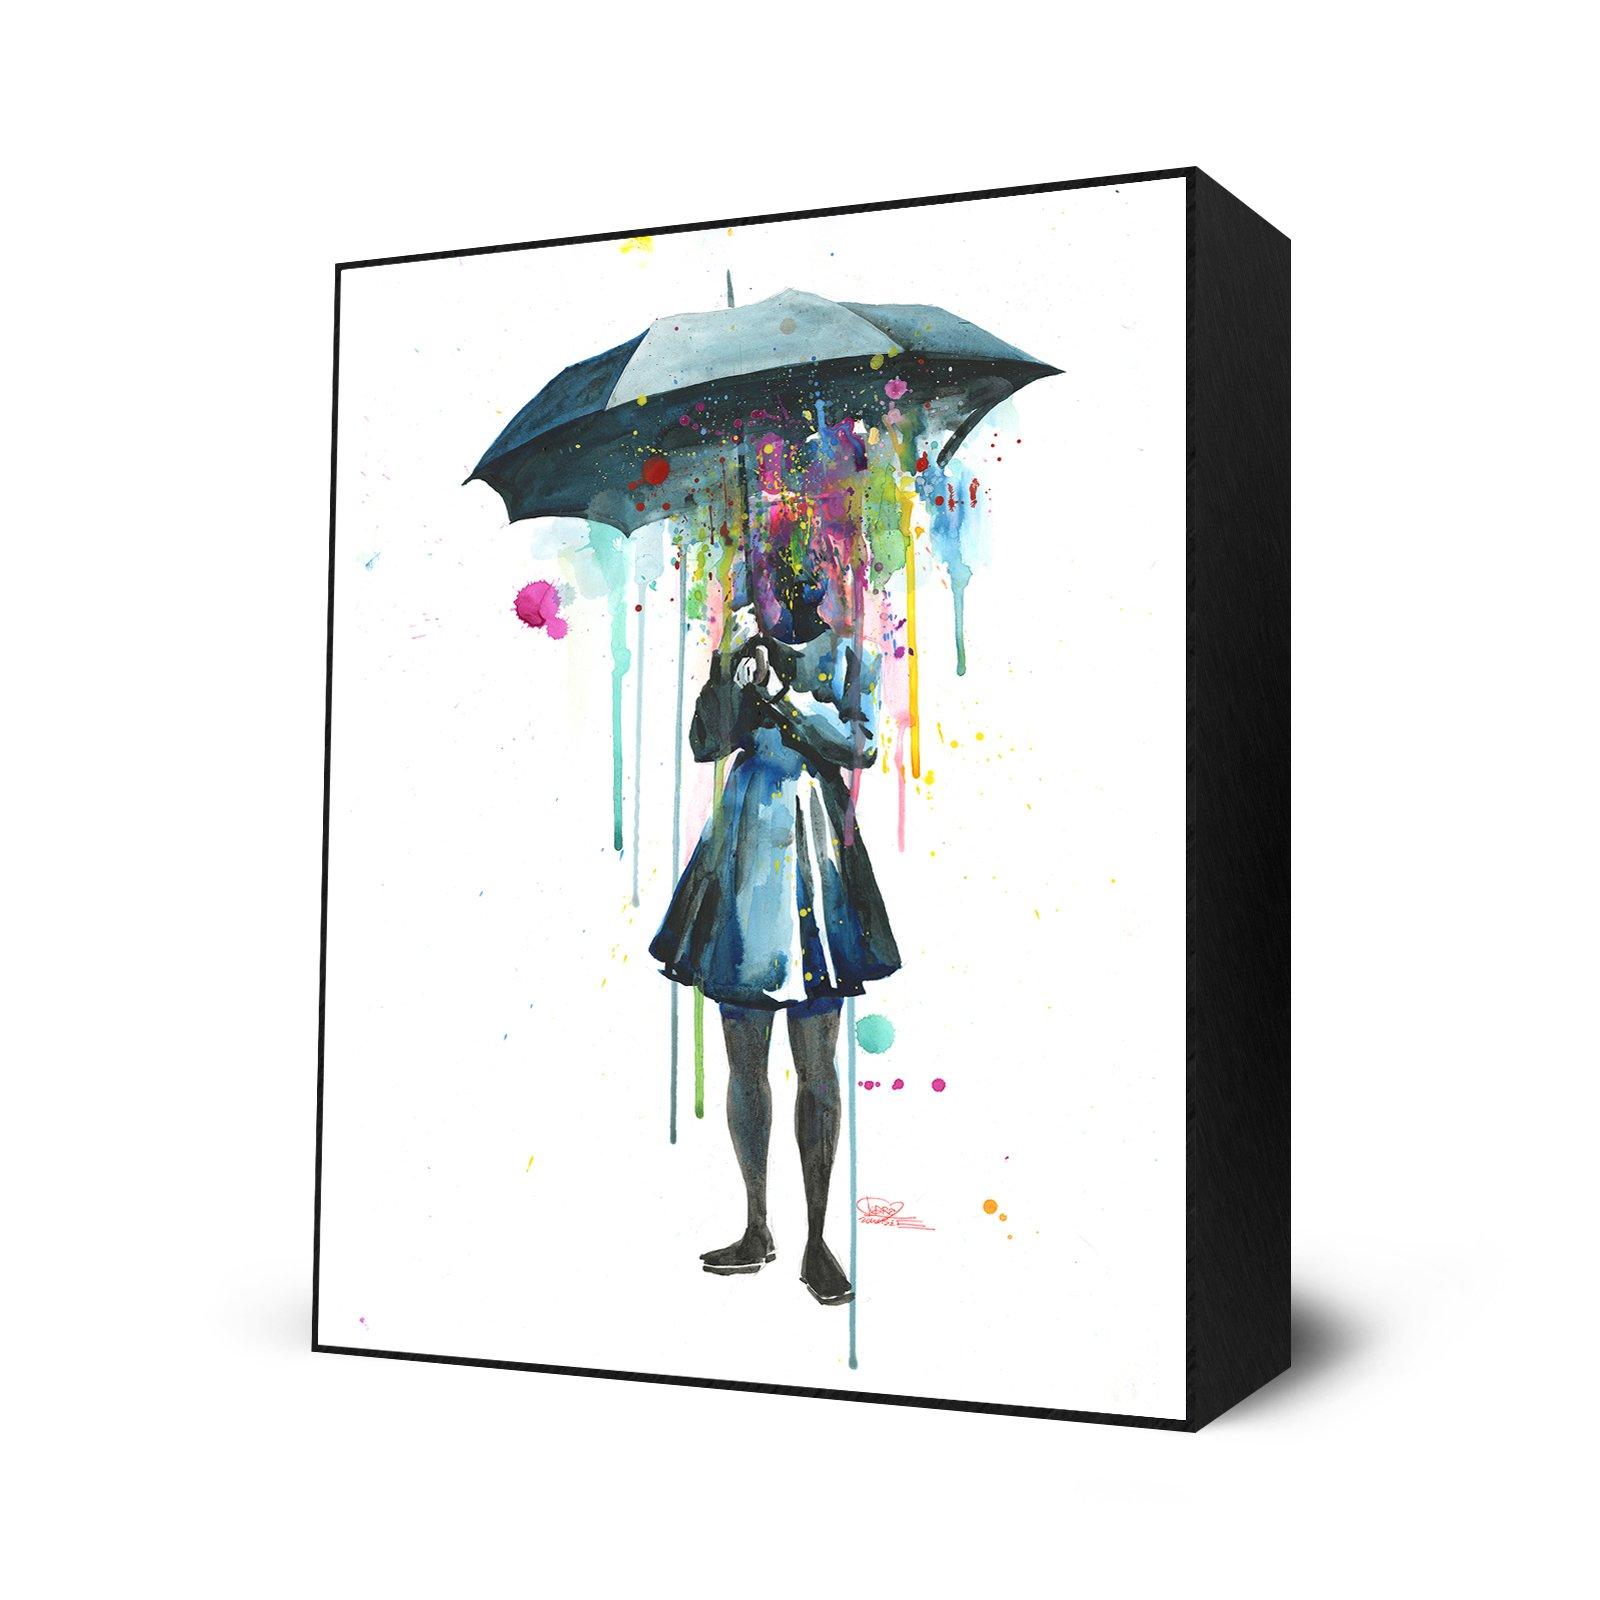 Rainy by Eyes On Walls